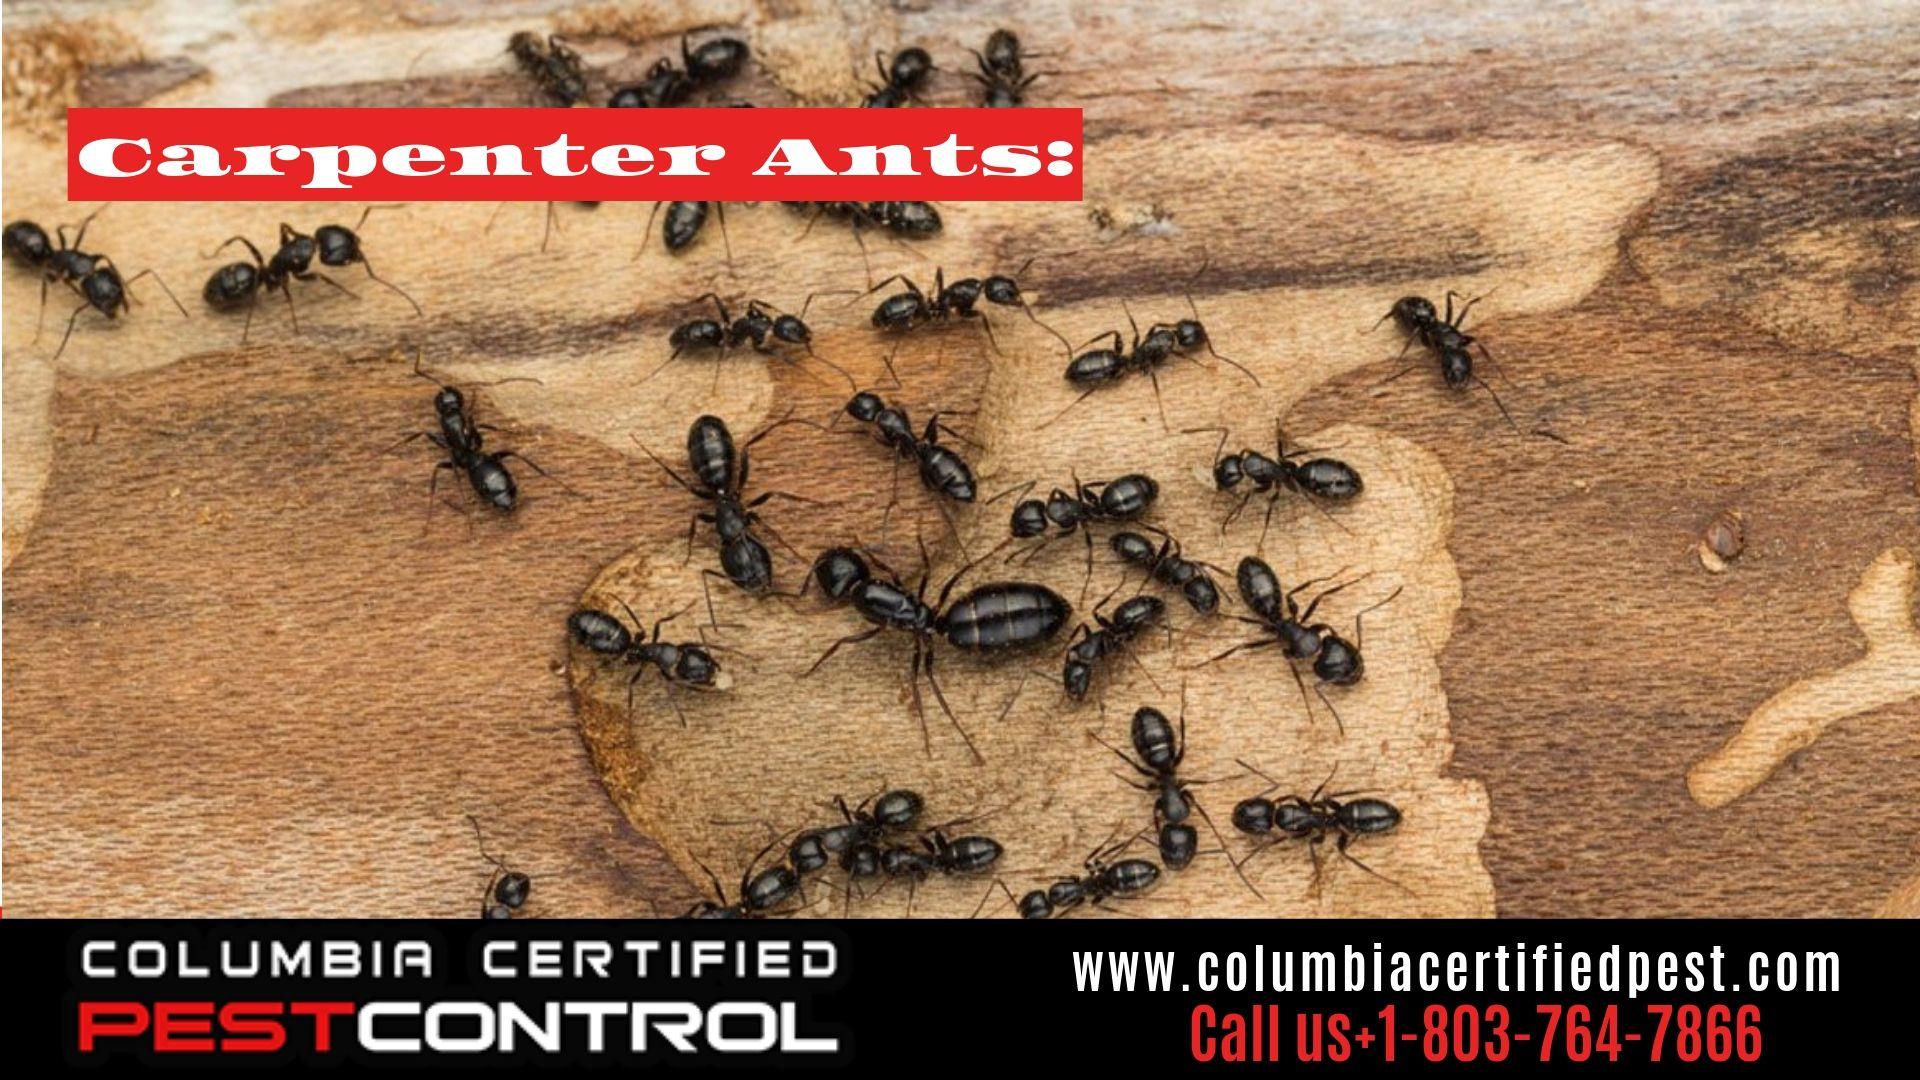 Ant Exterminators In Elgin Lexington Columbia Sc Fire Ant Pest Control Ant Pest Control Pest Control Types Of Ants